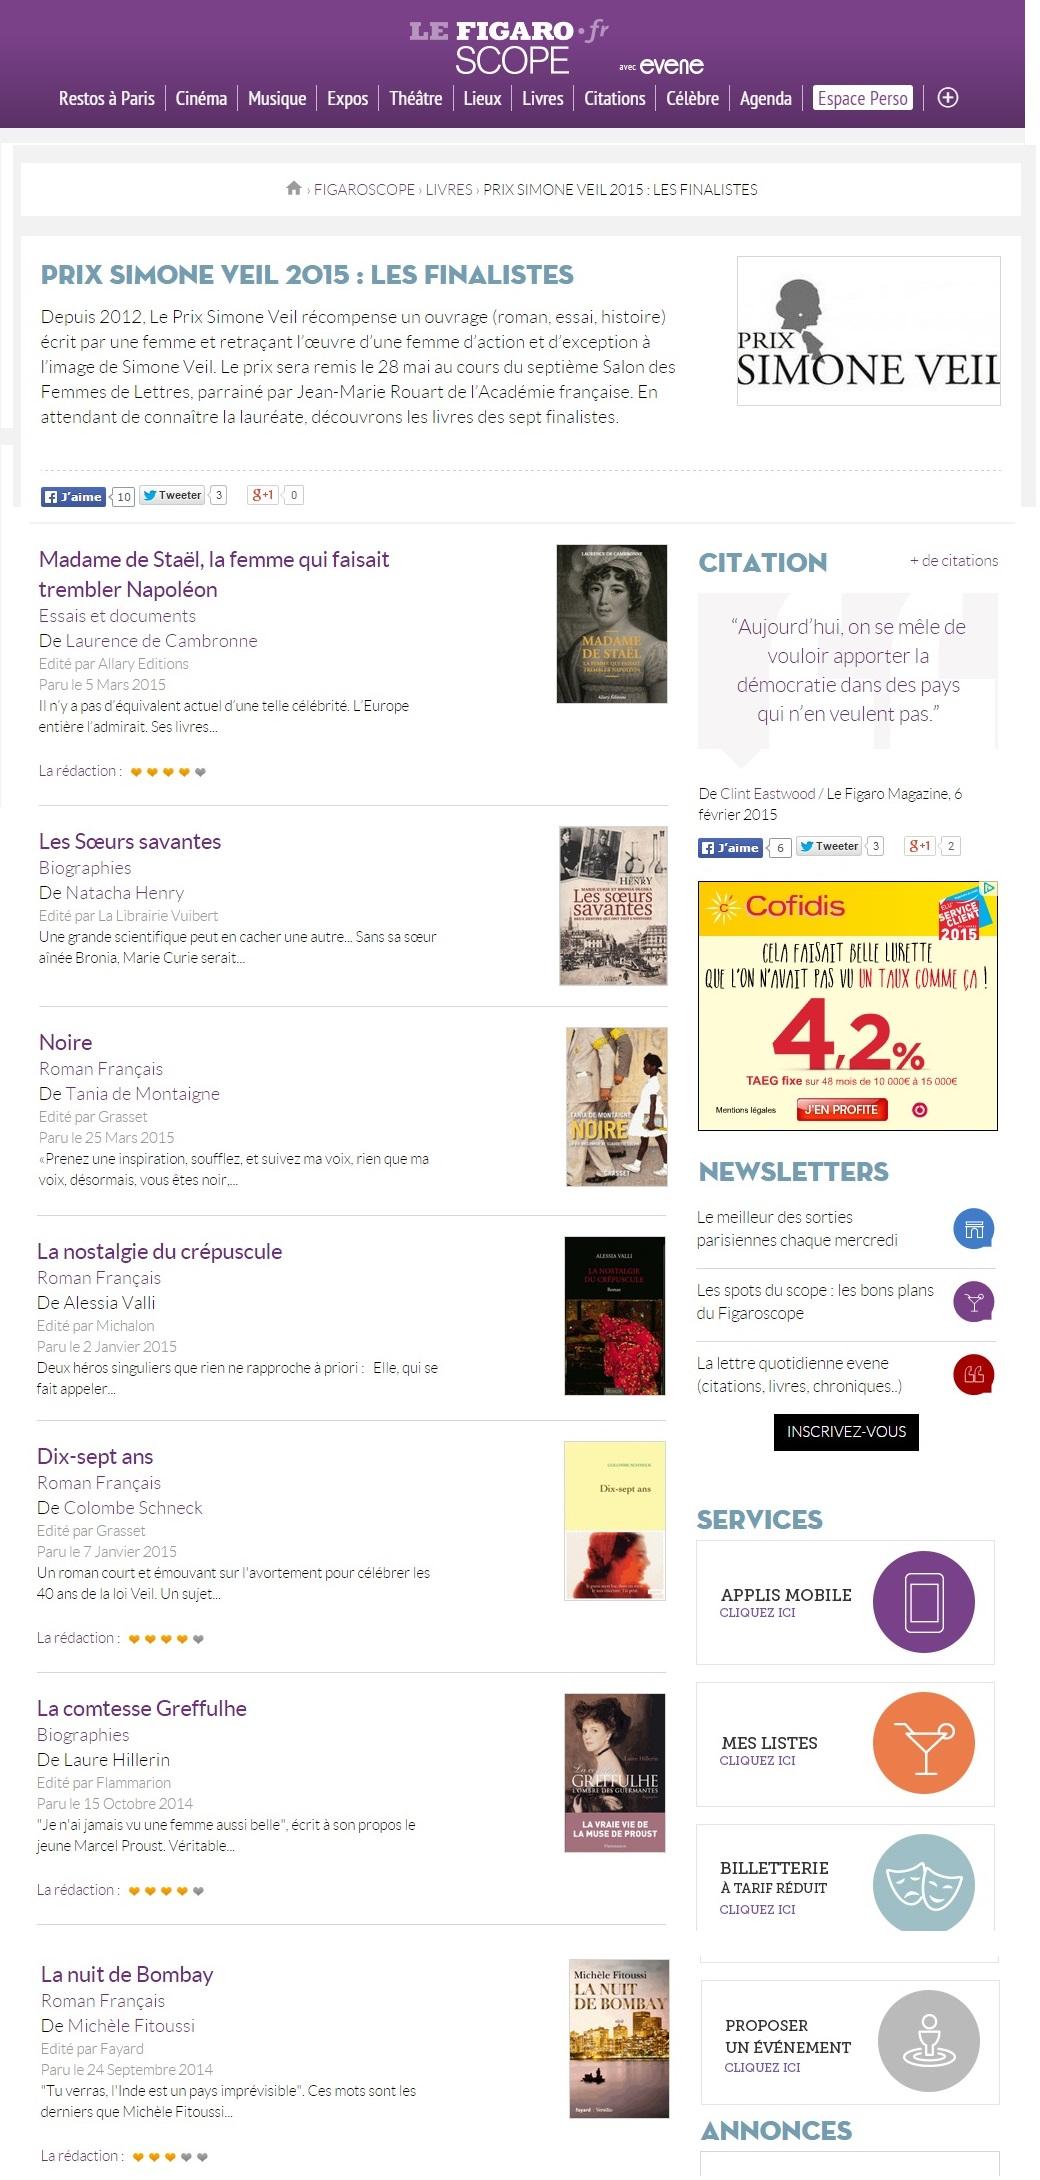 Article Figaroscope Prix Simone Veil 2015